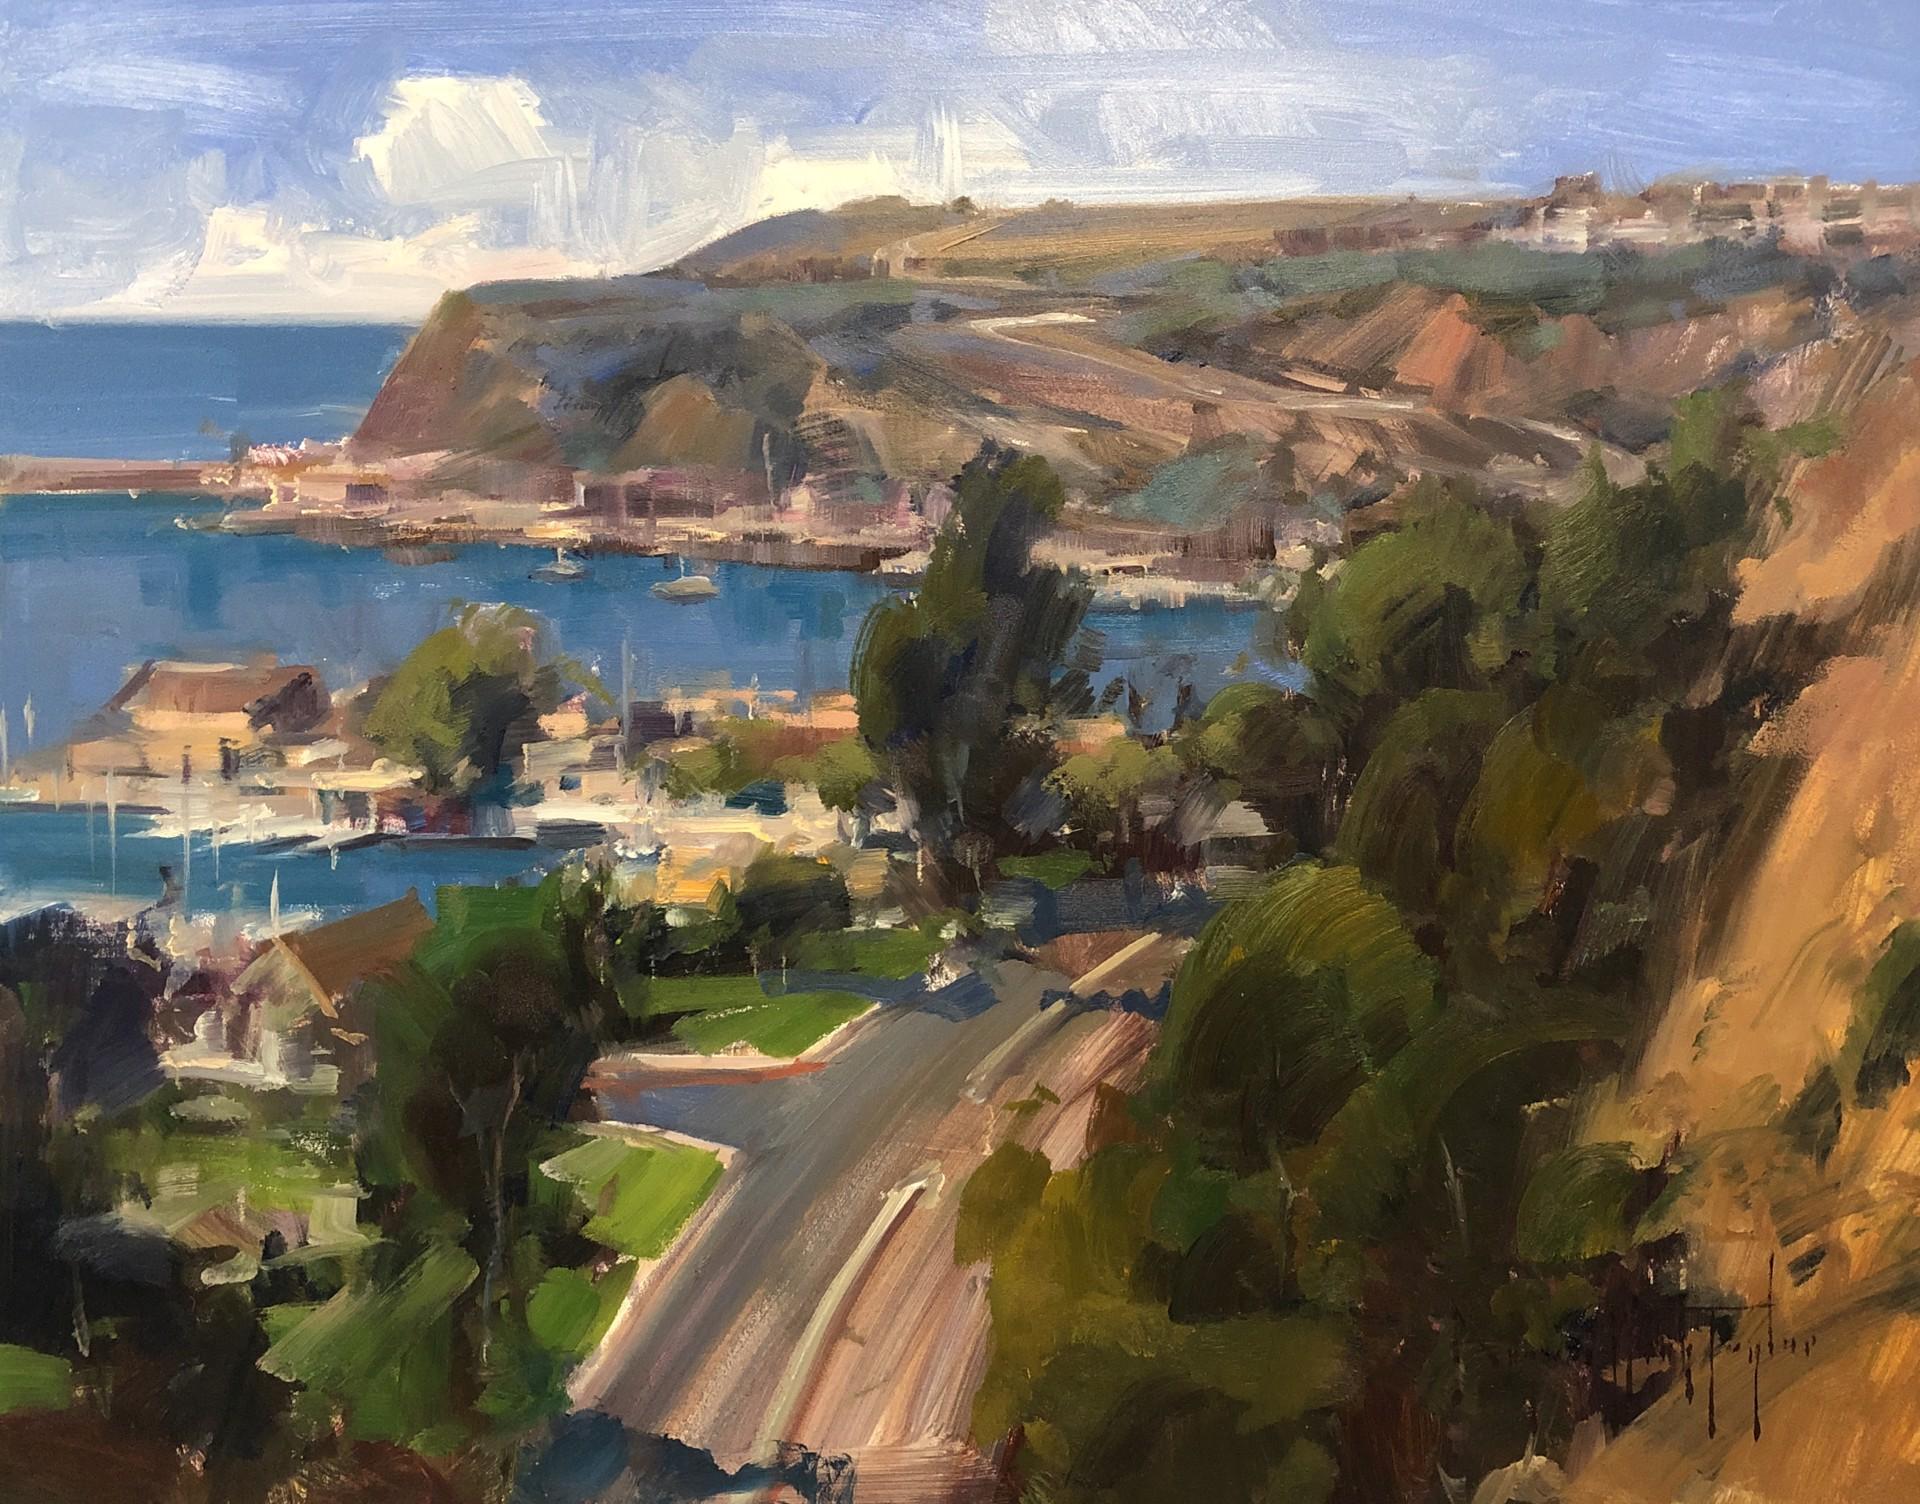 Dana Point Overlook by Bryan Mark Taylor